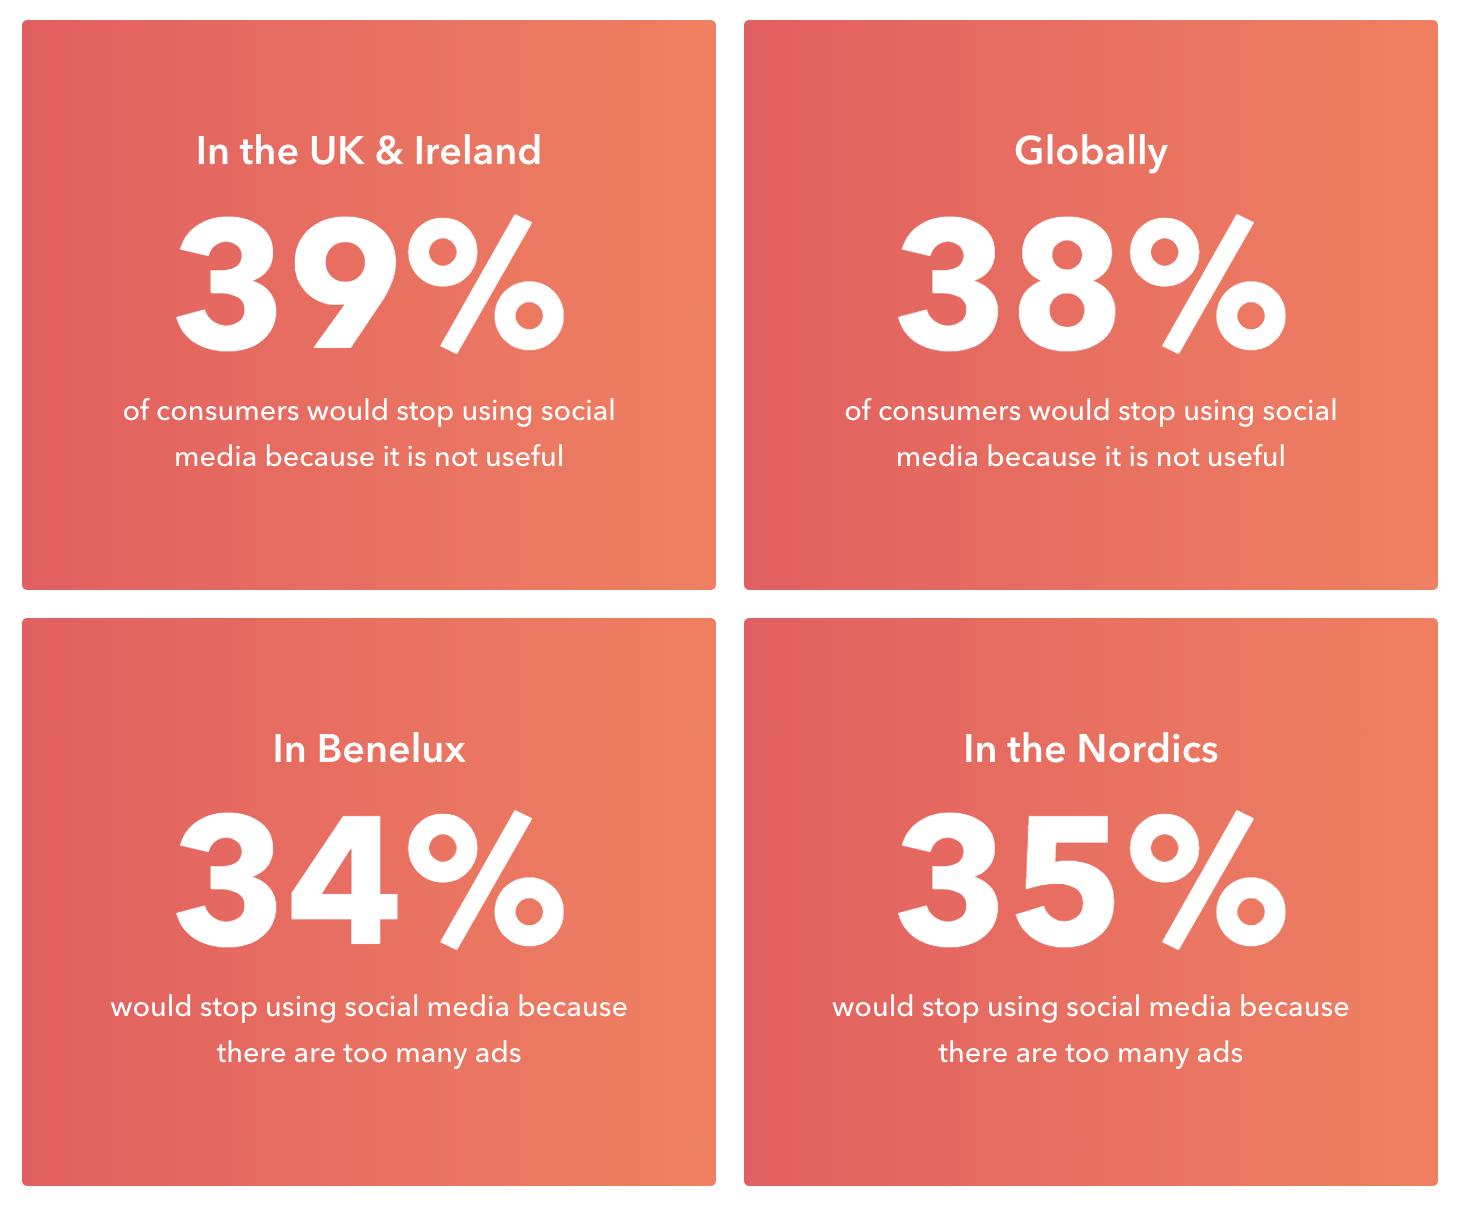 2019 European Social Media Report Usage Data